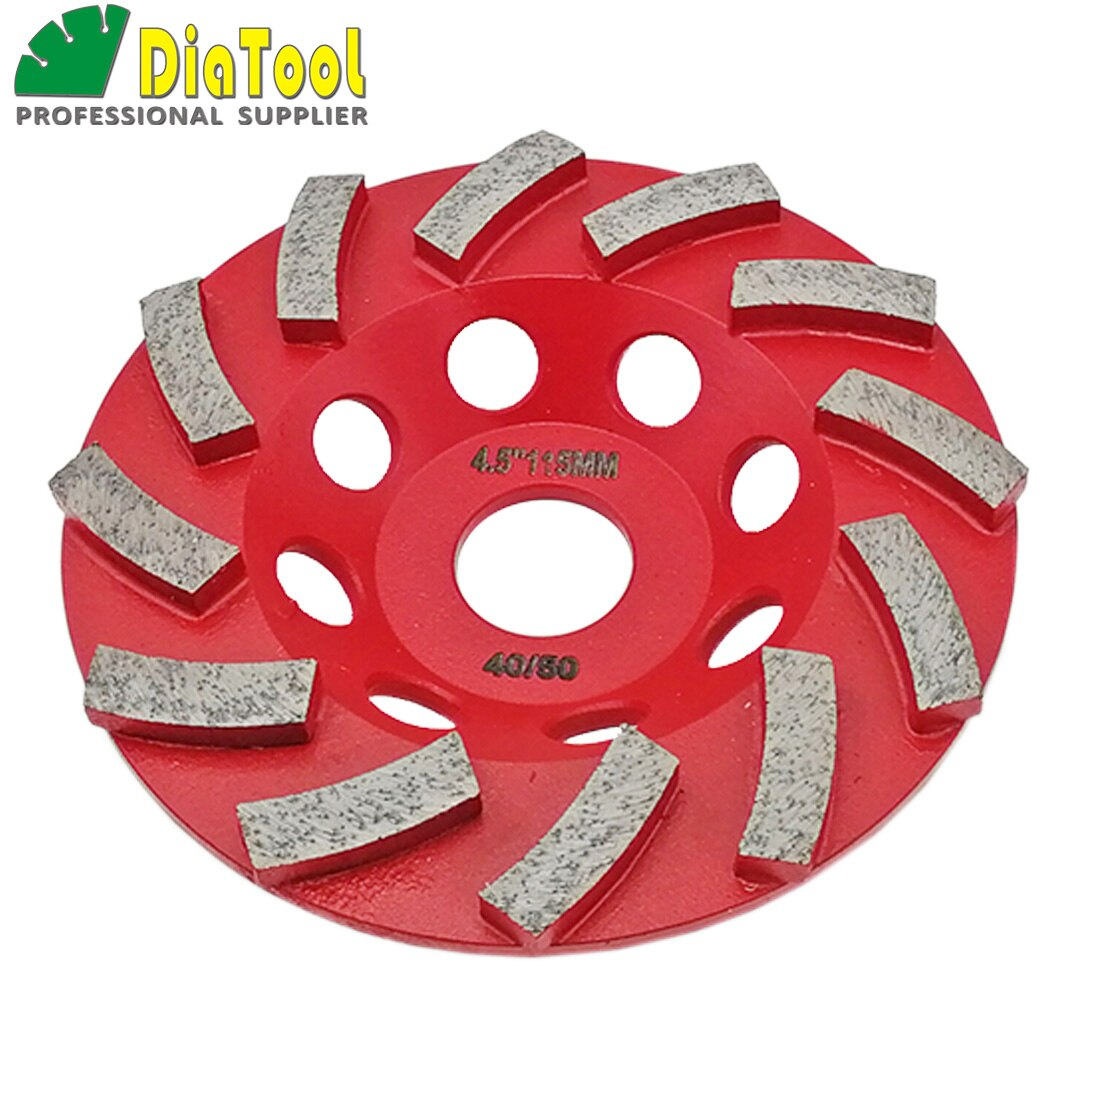 "SHDIATOOL 2pcs 4.5"" Segmented Diamond Turbo Grinding Cup Wheel for Concrete Arbor 7/8"" 115mm grinding disc"